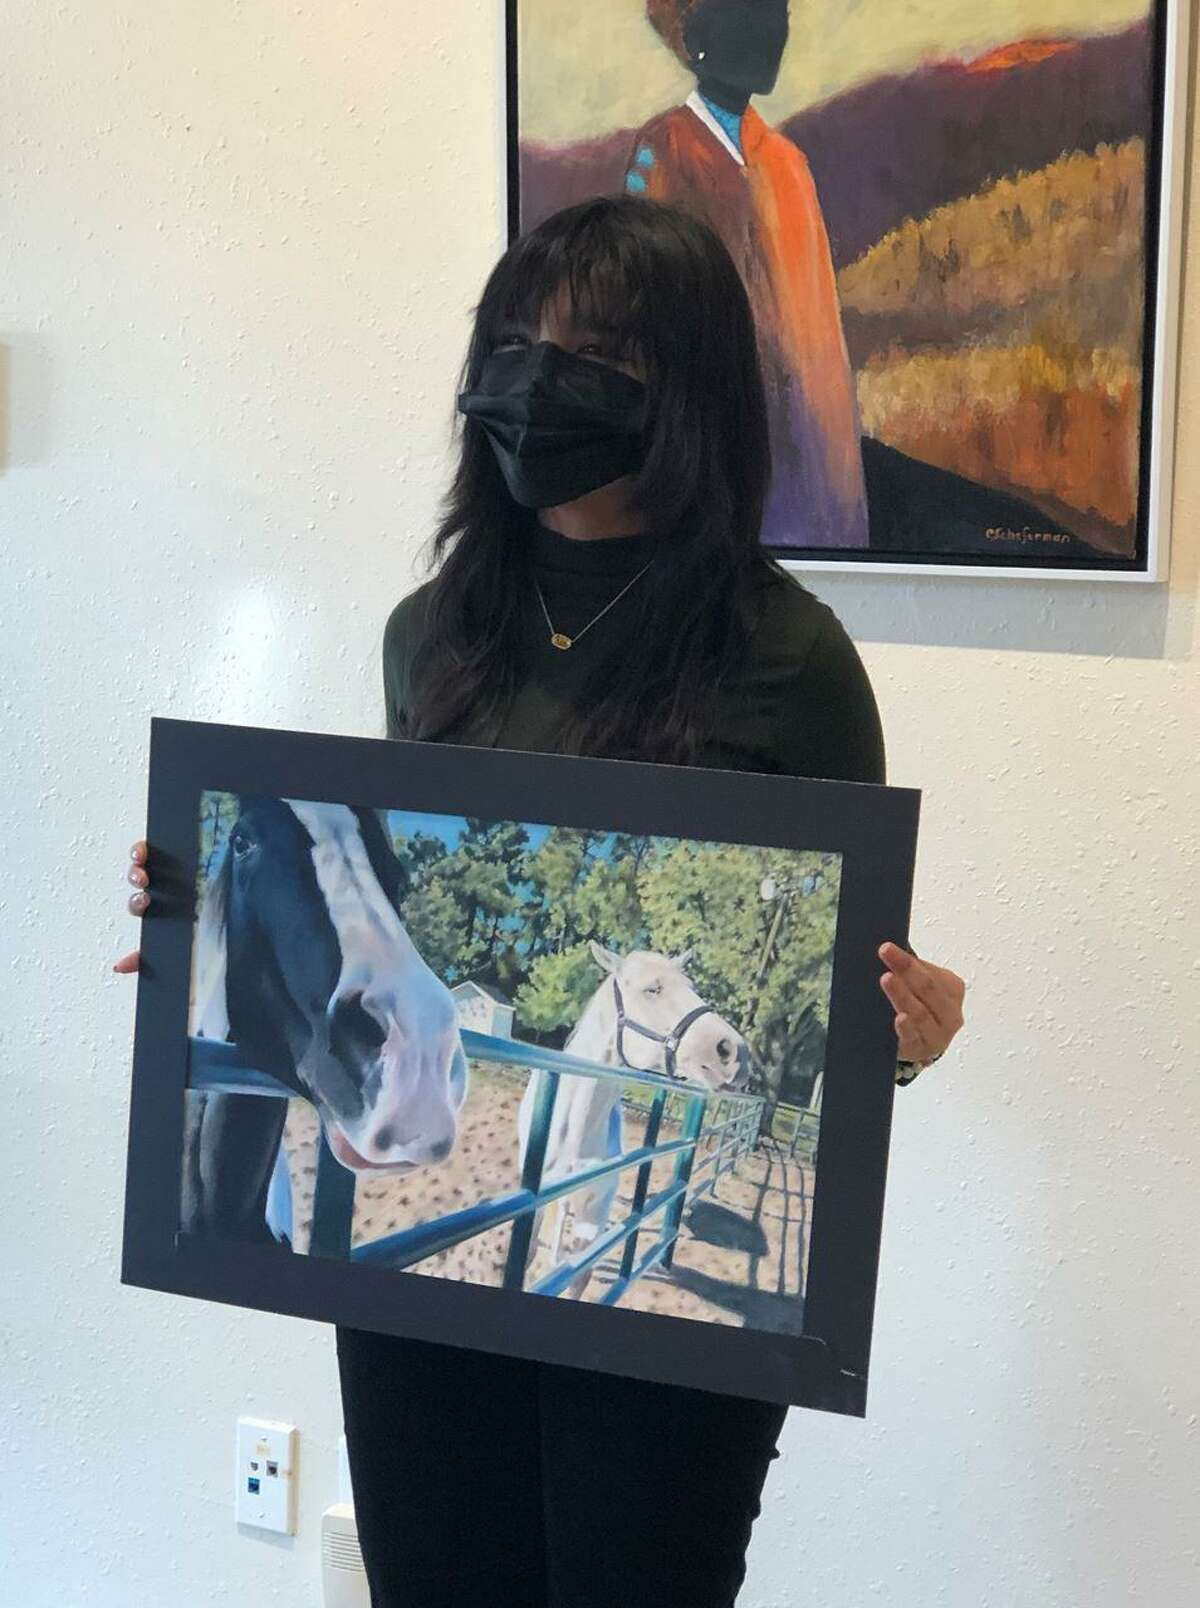 Jacqueline Degouado won the Adrianne Gerlach Memorial Art Scholarship for best western and wildlife art with her work